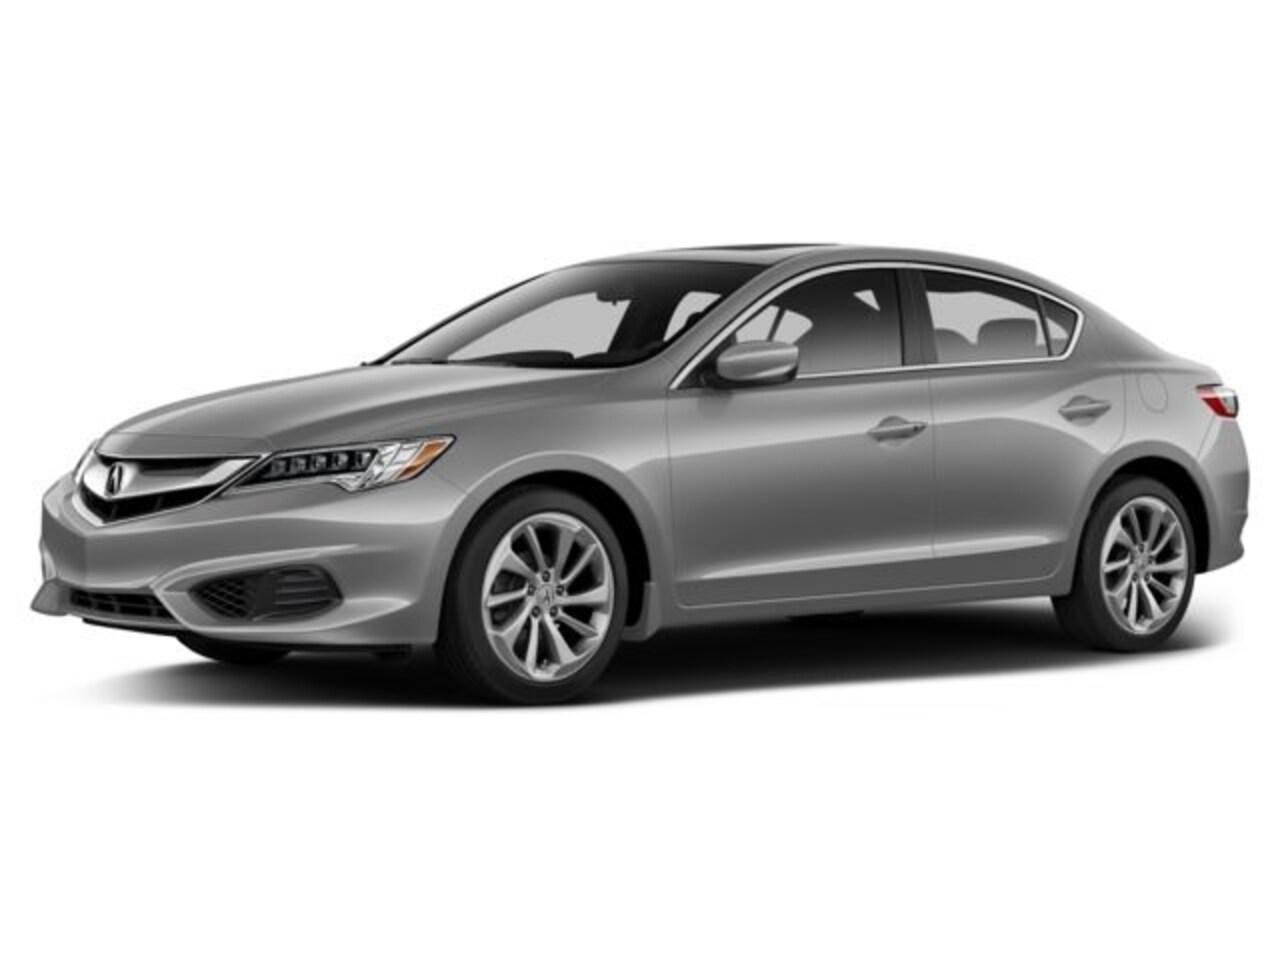 New 2017 Acura ILX Premium 8dct St. Catharines